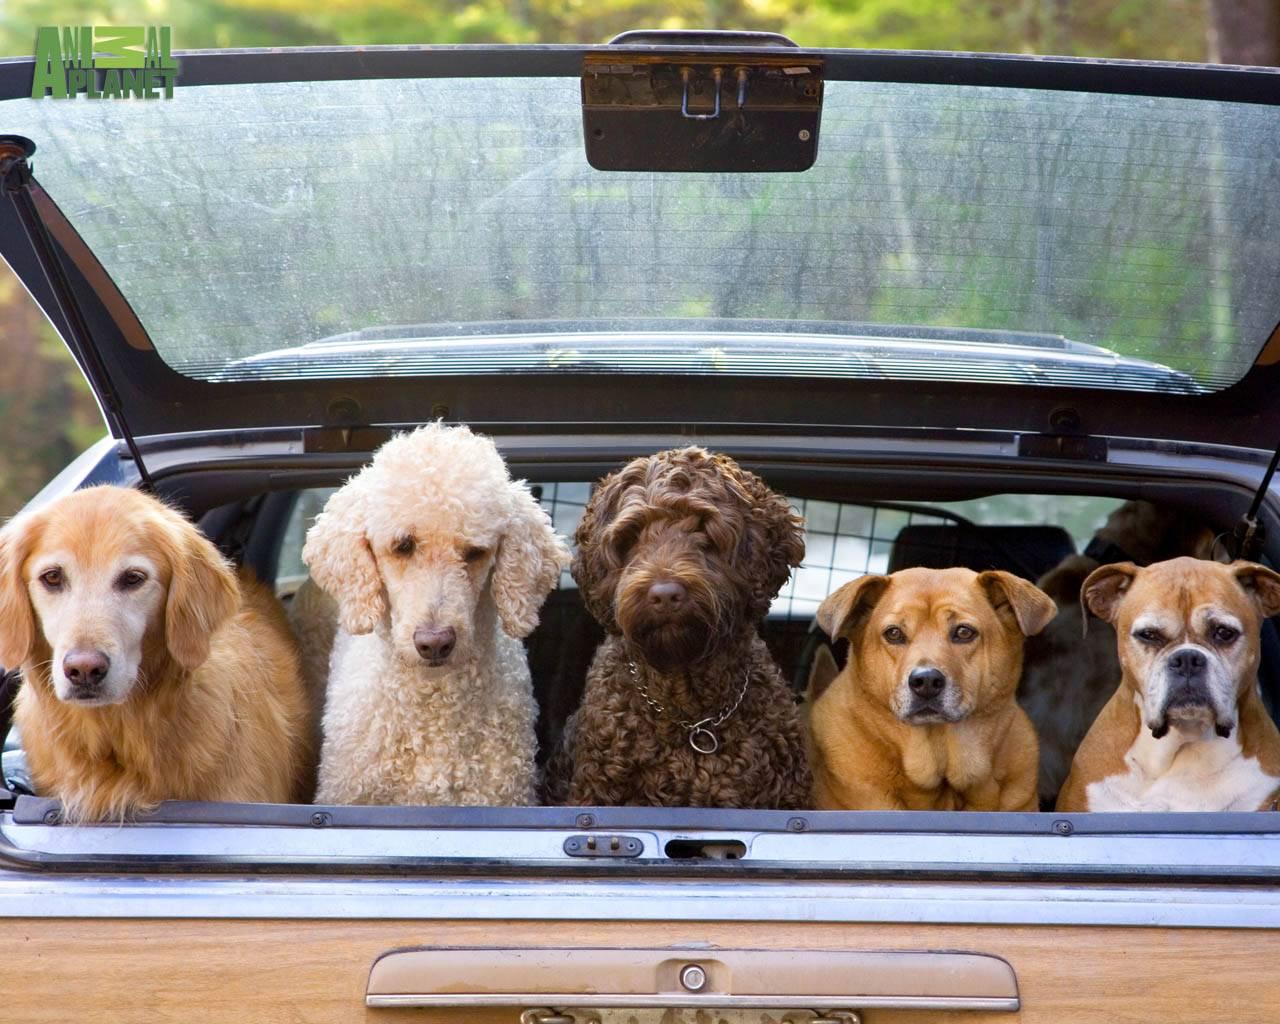 48769 dogs free dogs wallpaperjpg 1280x1024